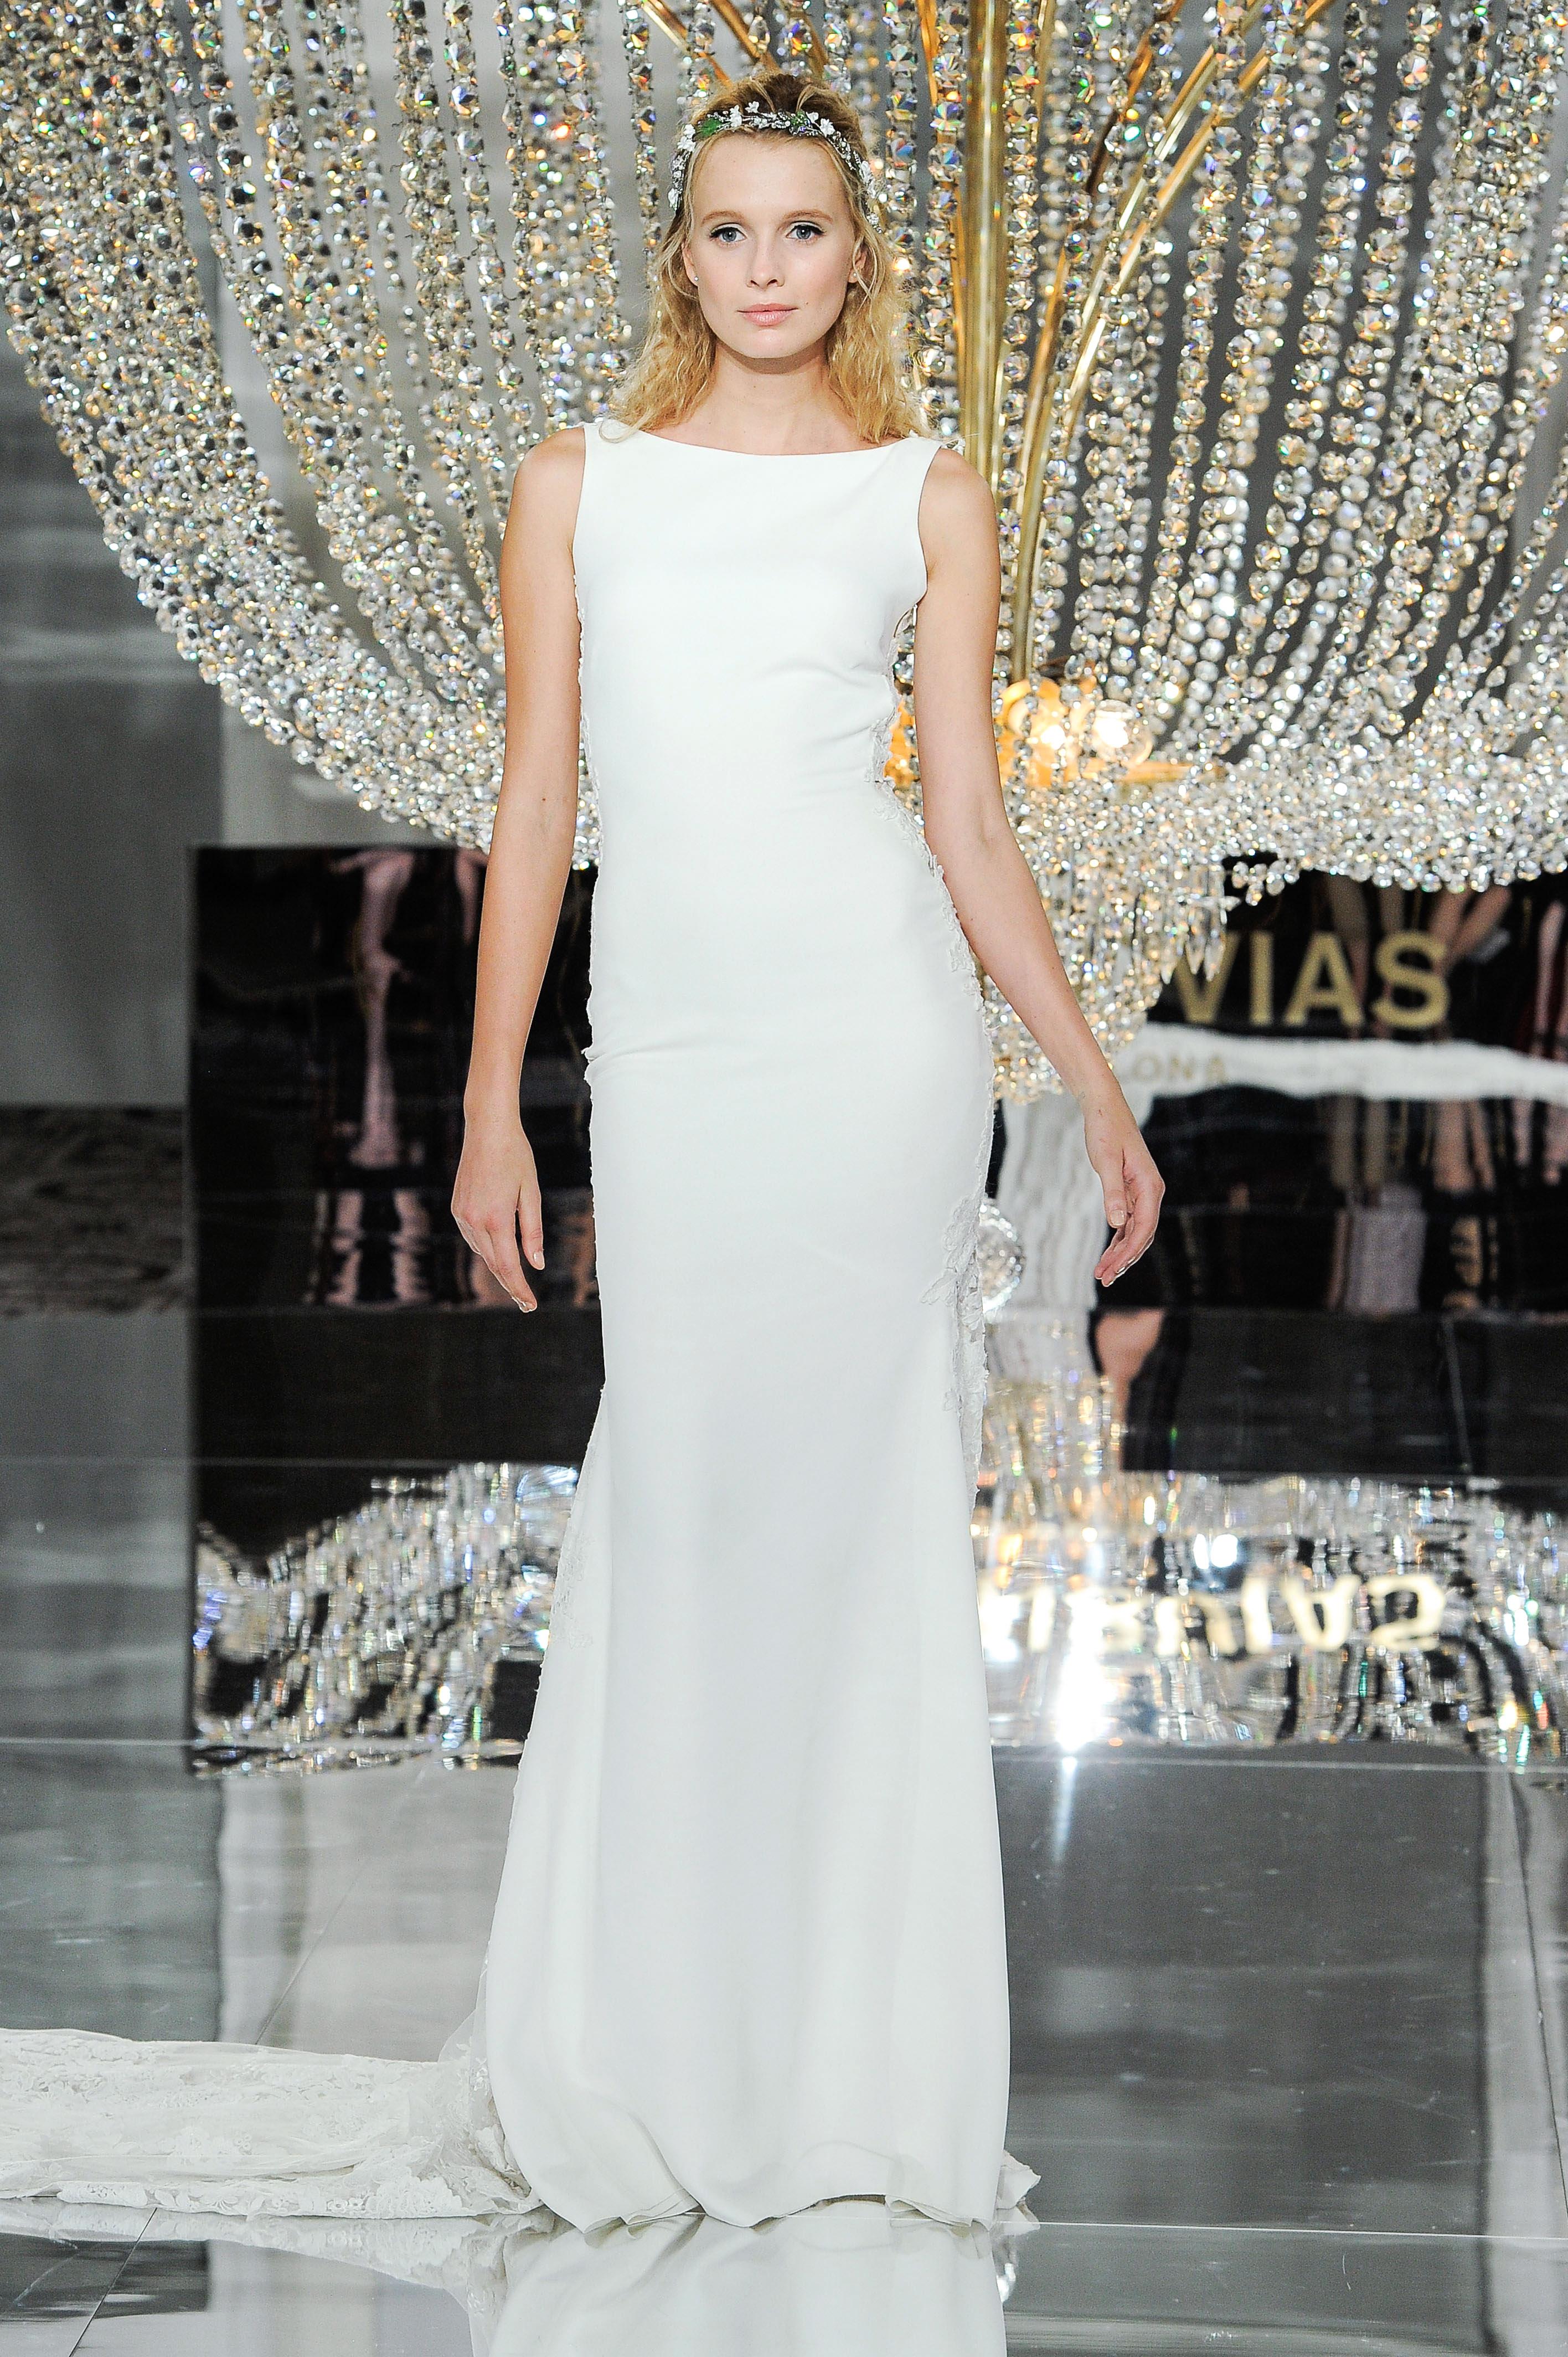 pronovias wedding dress fall 2018 boatneck sleeveless column